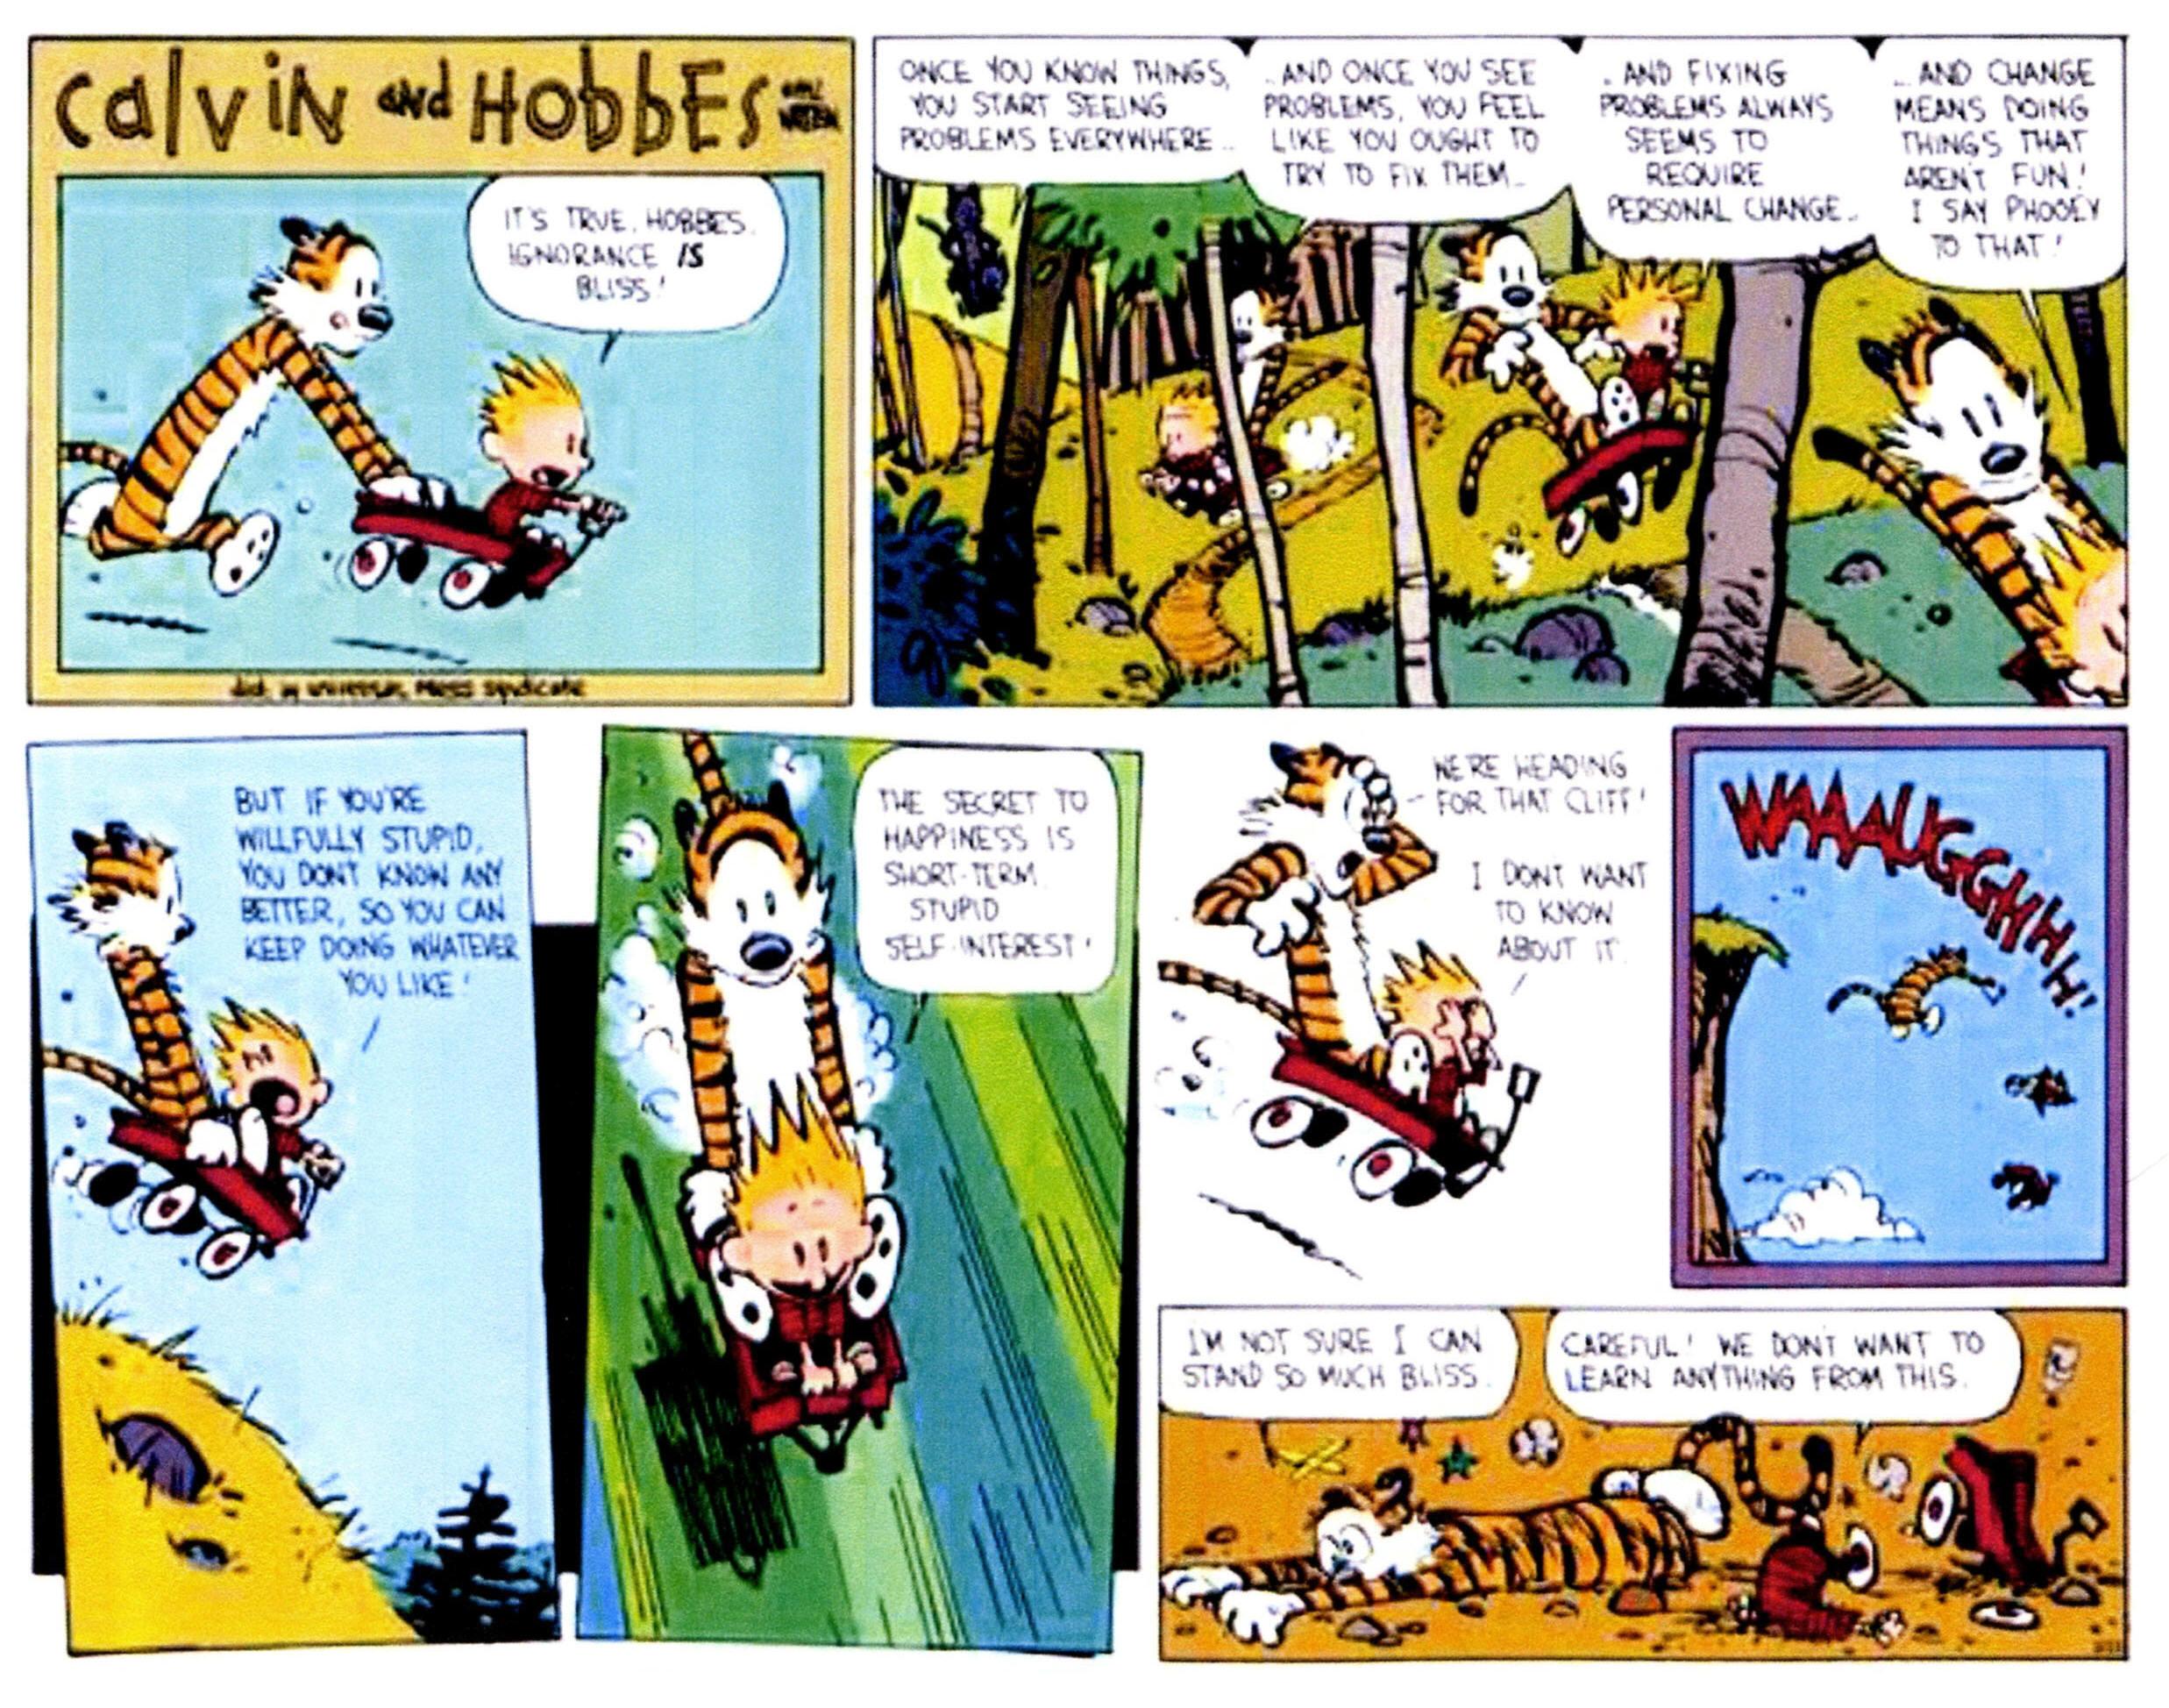 Calvin & Hobbs wisdom